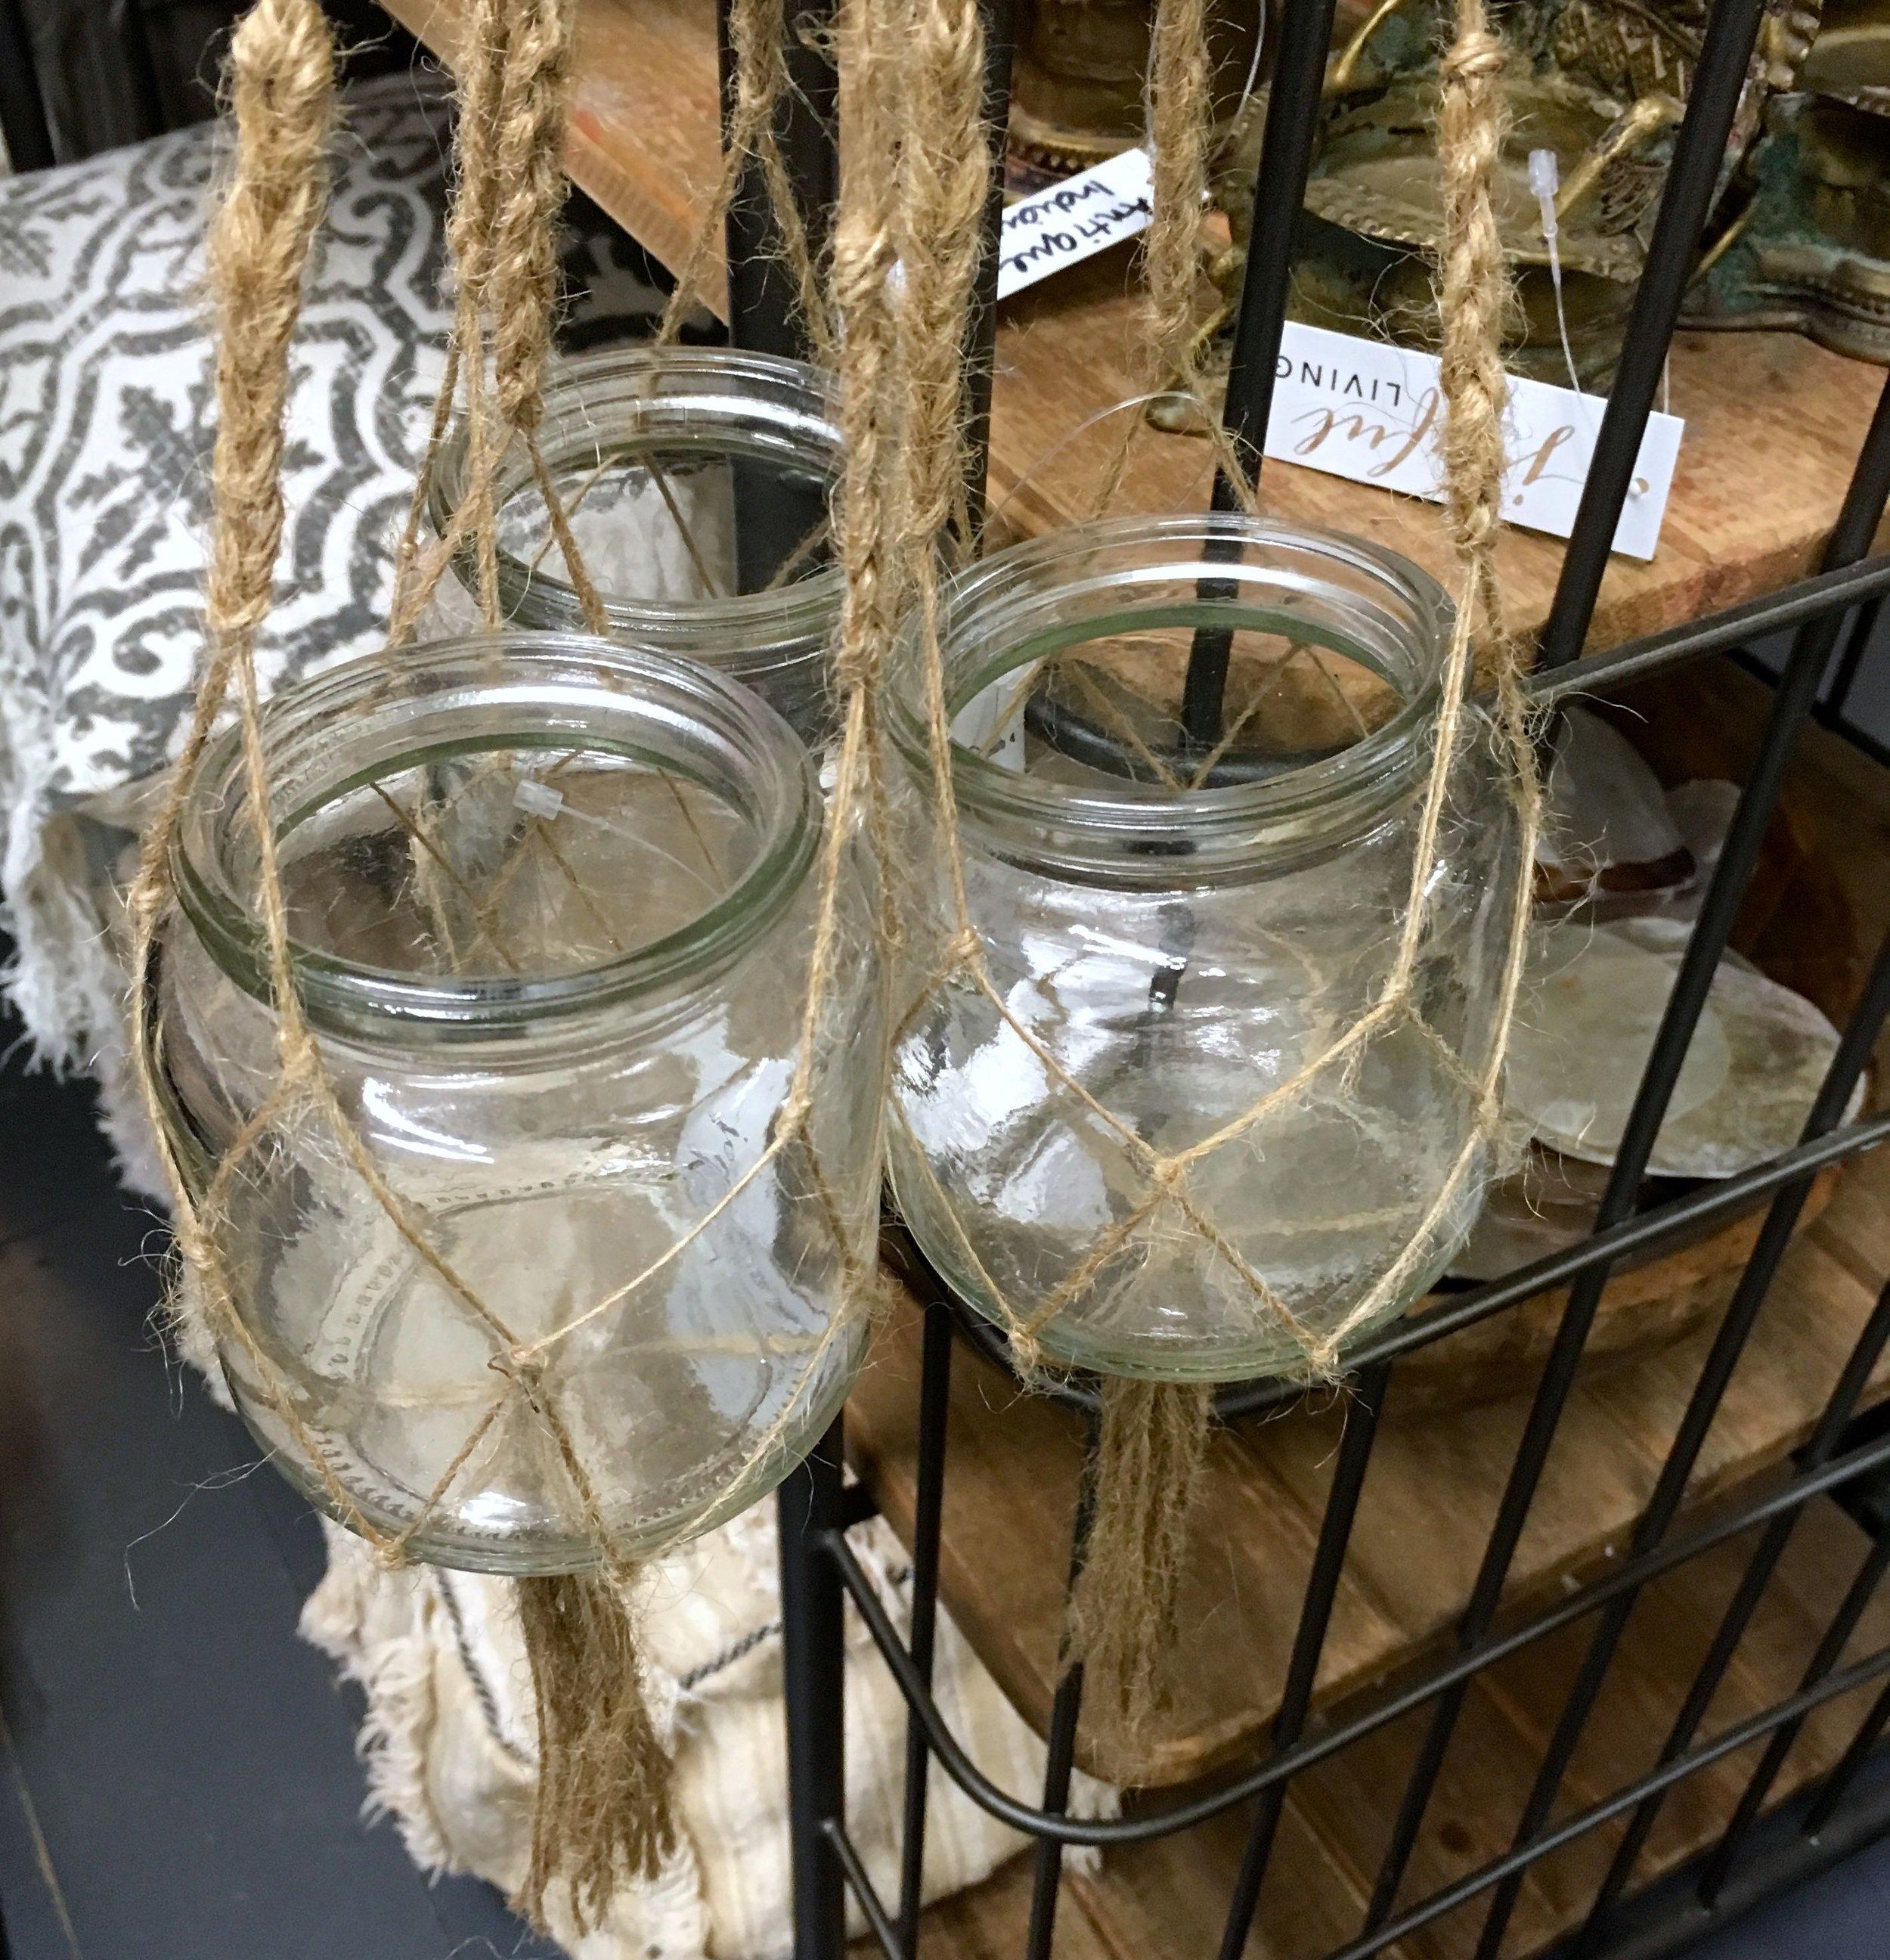 Glass jars hung in twine